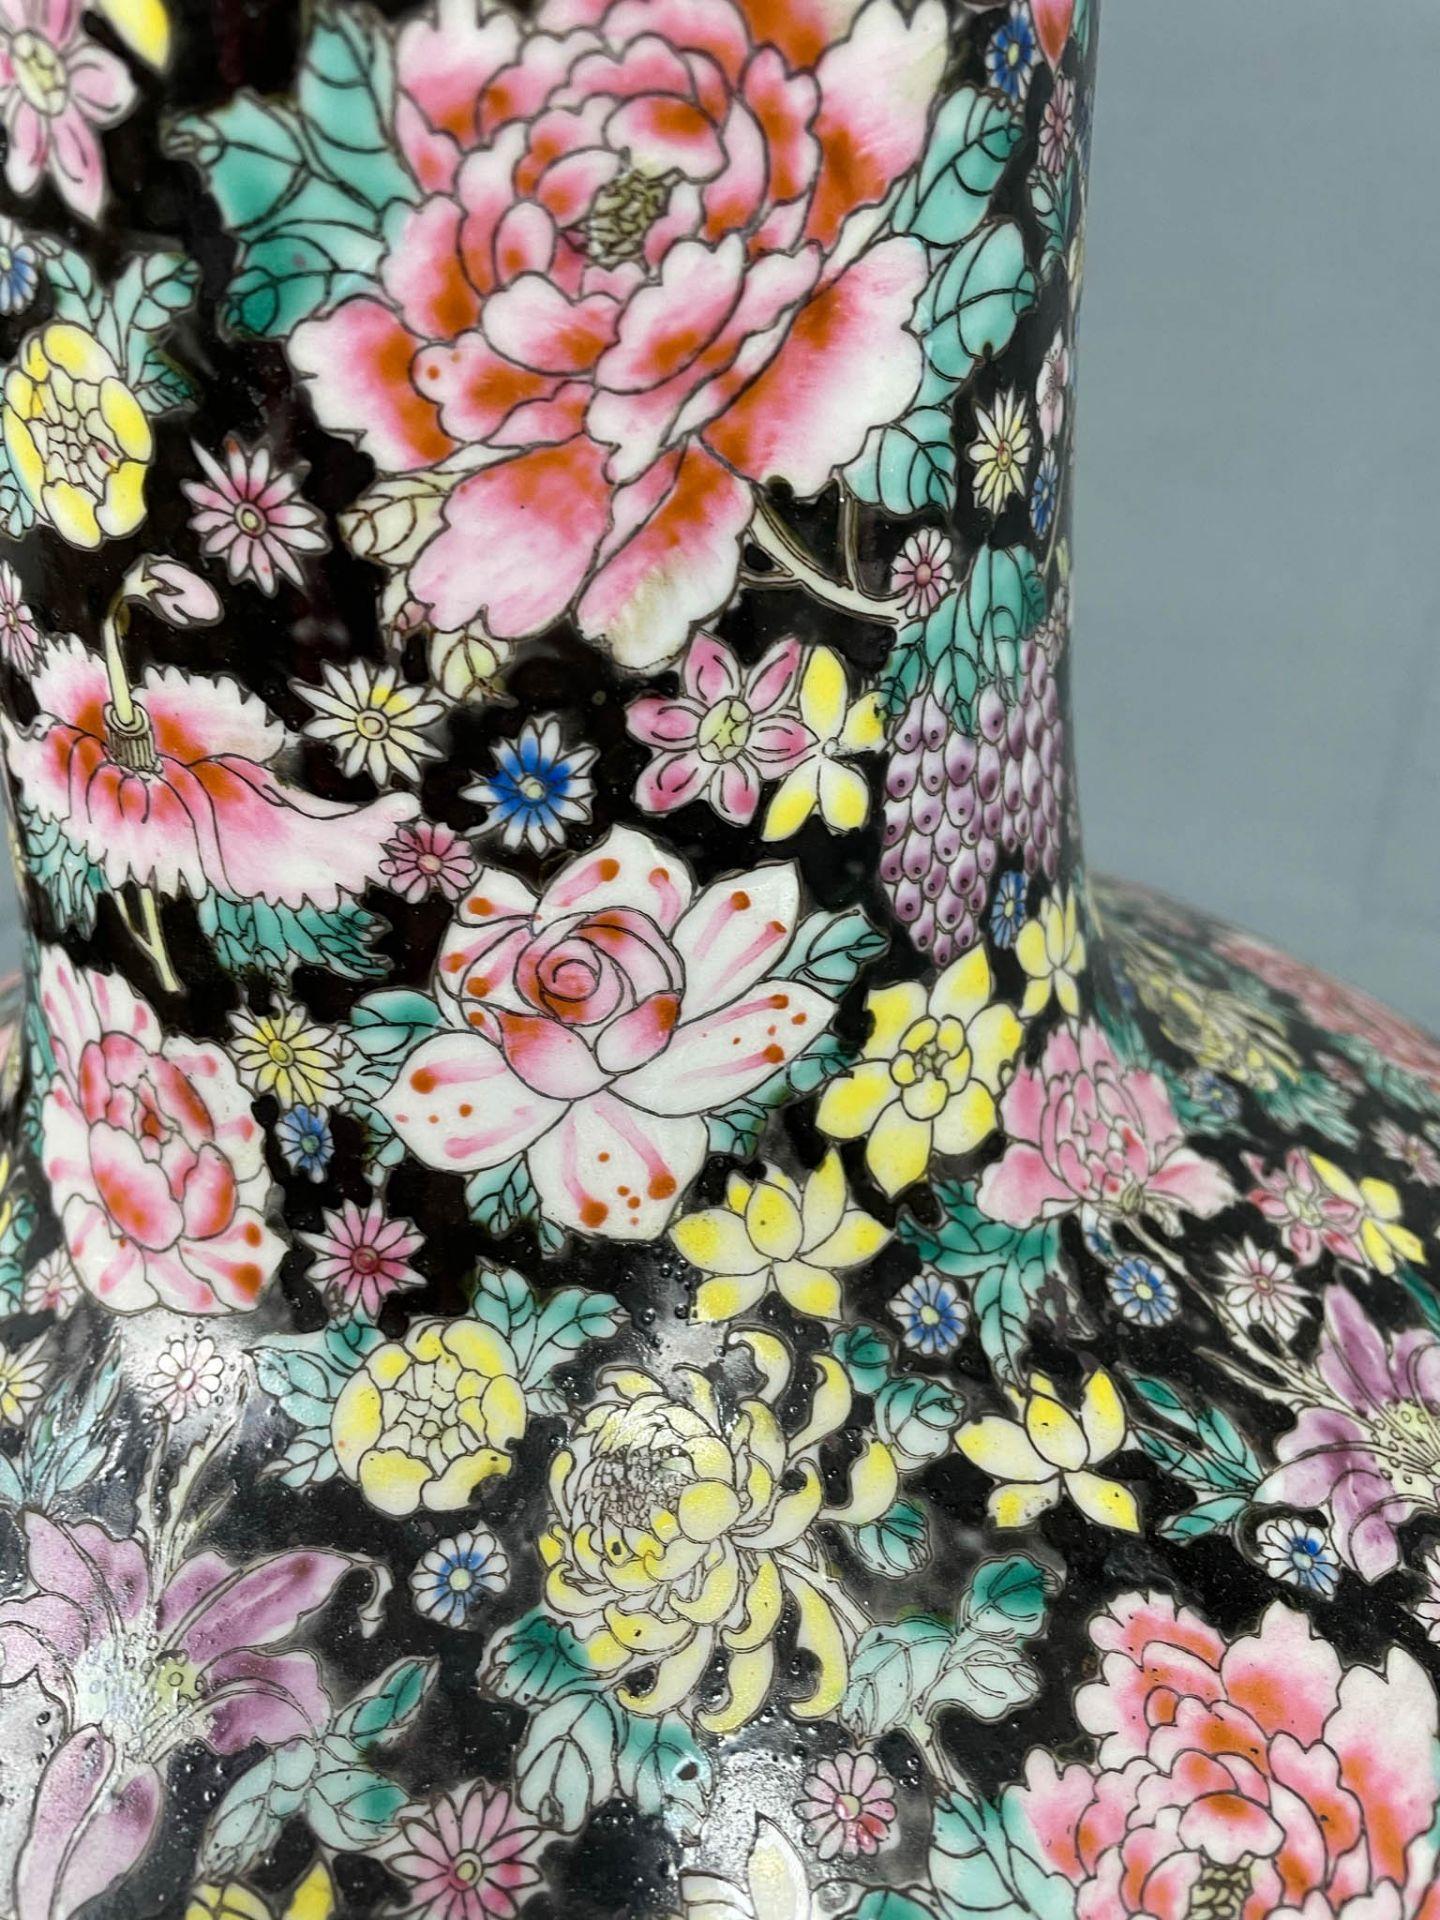 China. Porzellan. Vase. Stempelmarke circa 1930 - 1950. 53 cm hoch. - Image 8 of 20